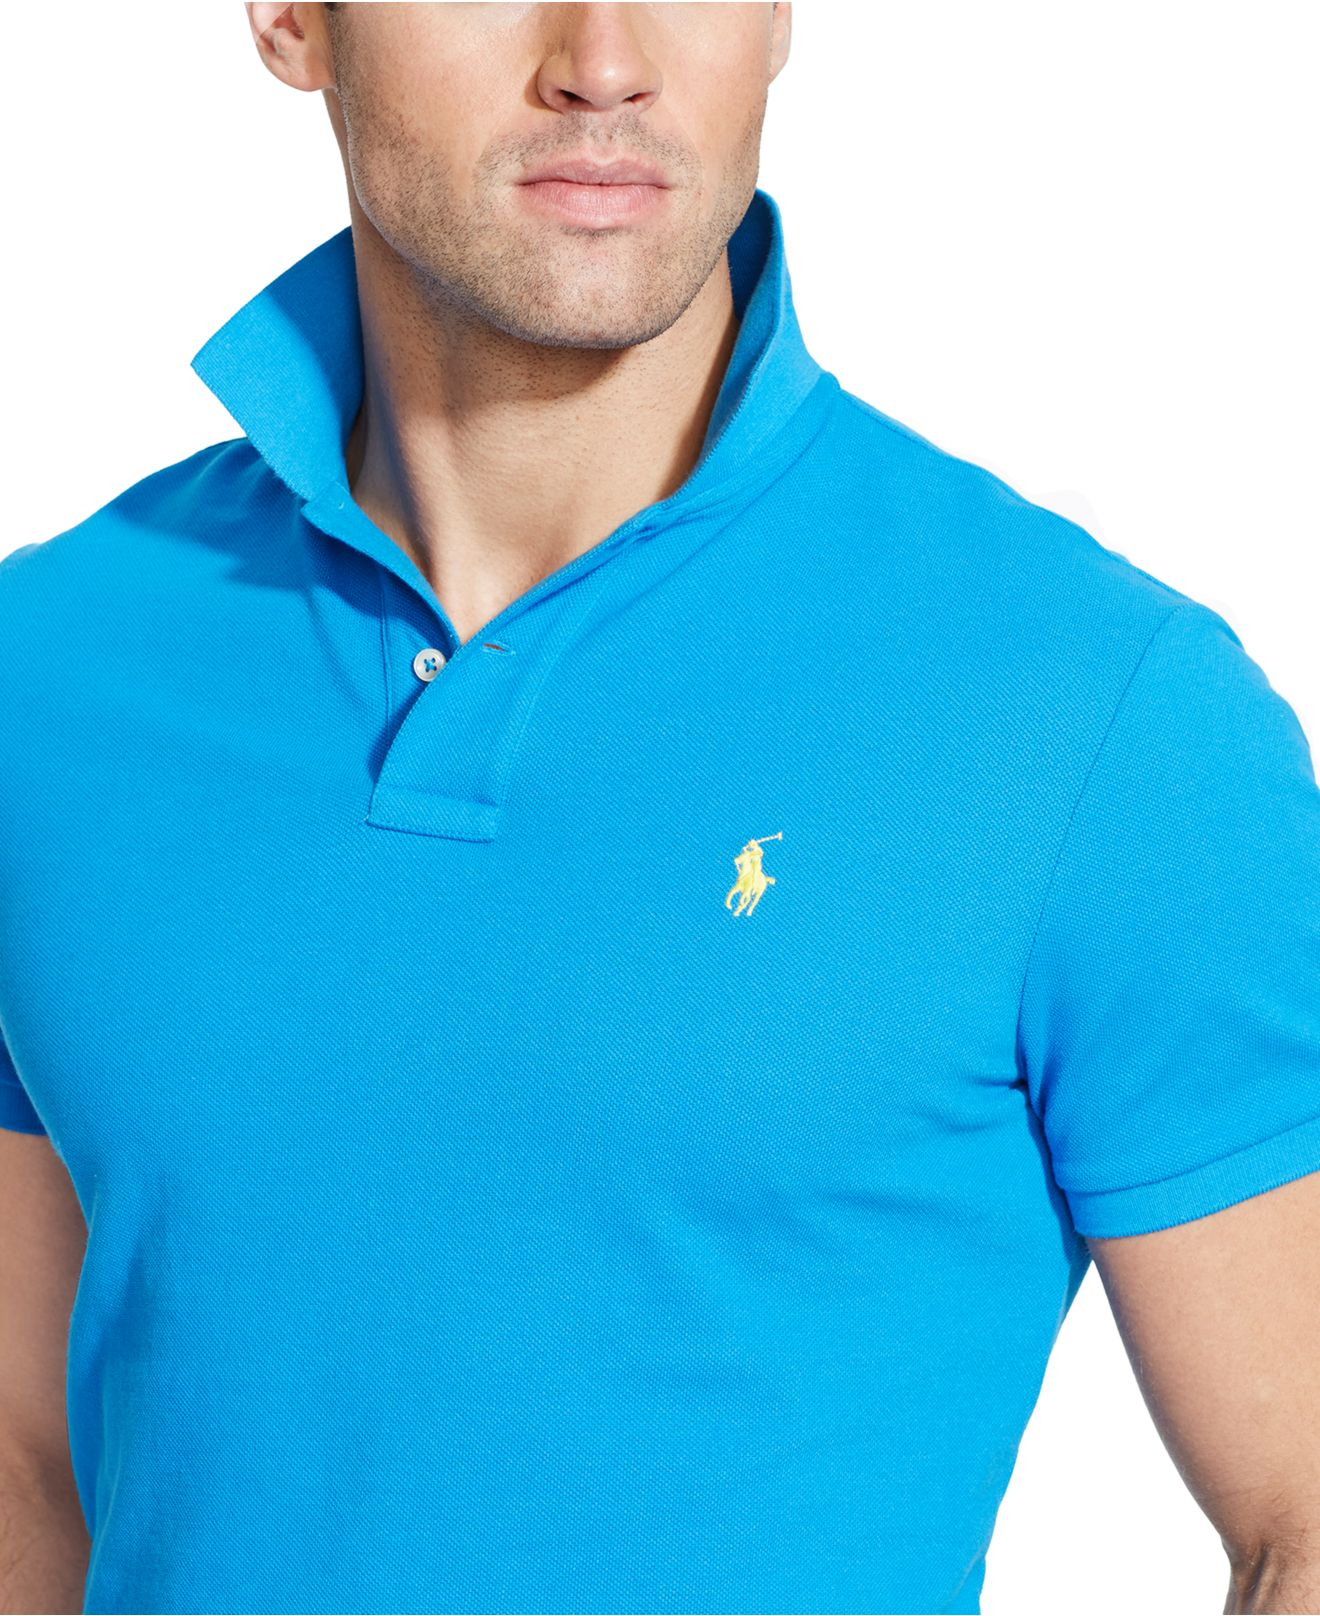 Lauren For Coupon Polo Shirts Uk Ralph 09d74 Vintage Custom Fit Code drBCxoe